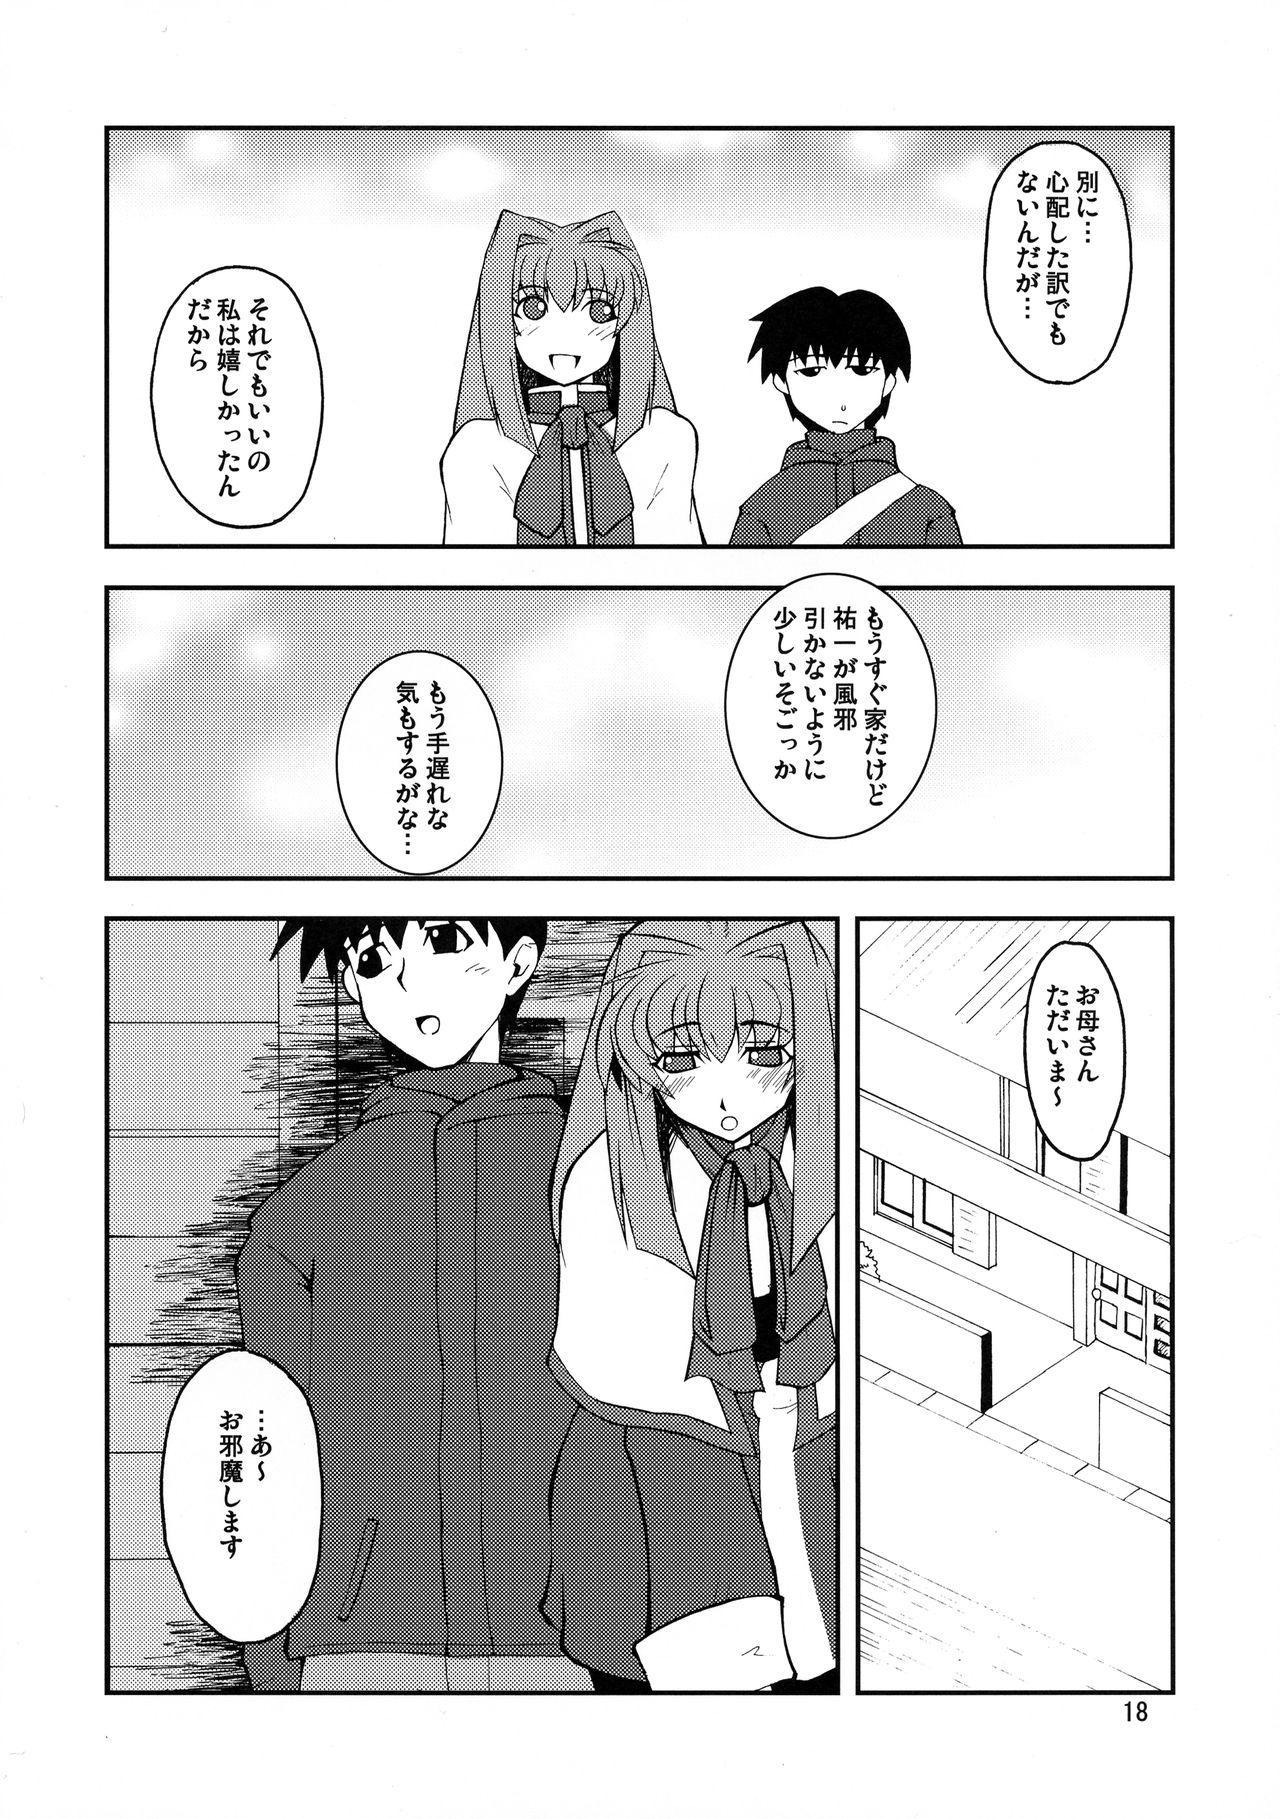 Kyouki Vol. 3~5 Remake Ver. 17